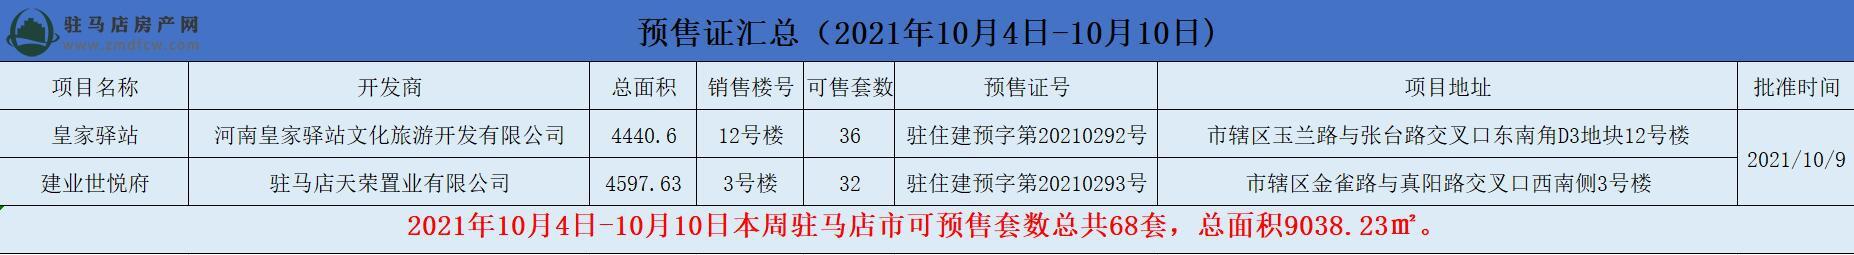 QQ鎴?浘20211012165654.jpg